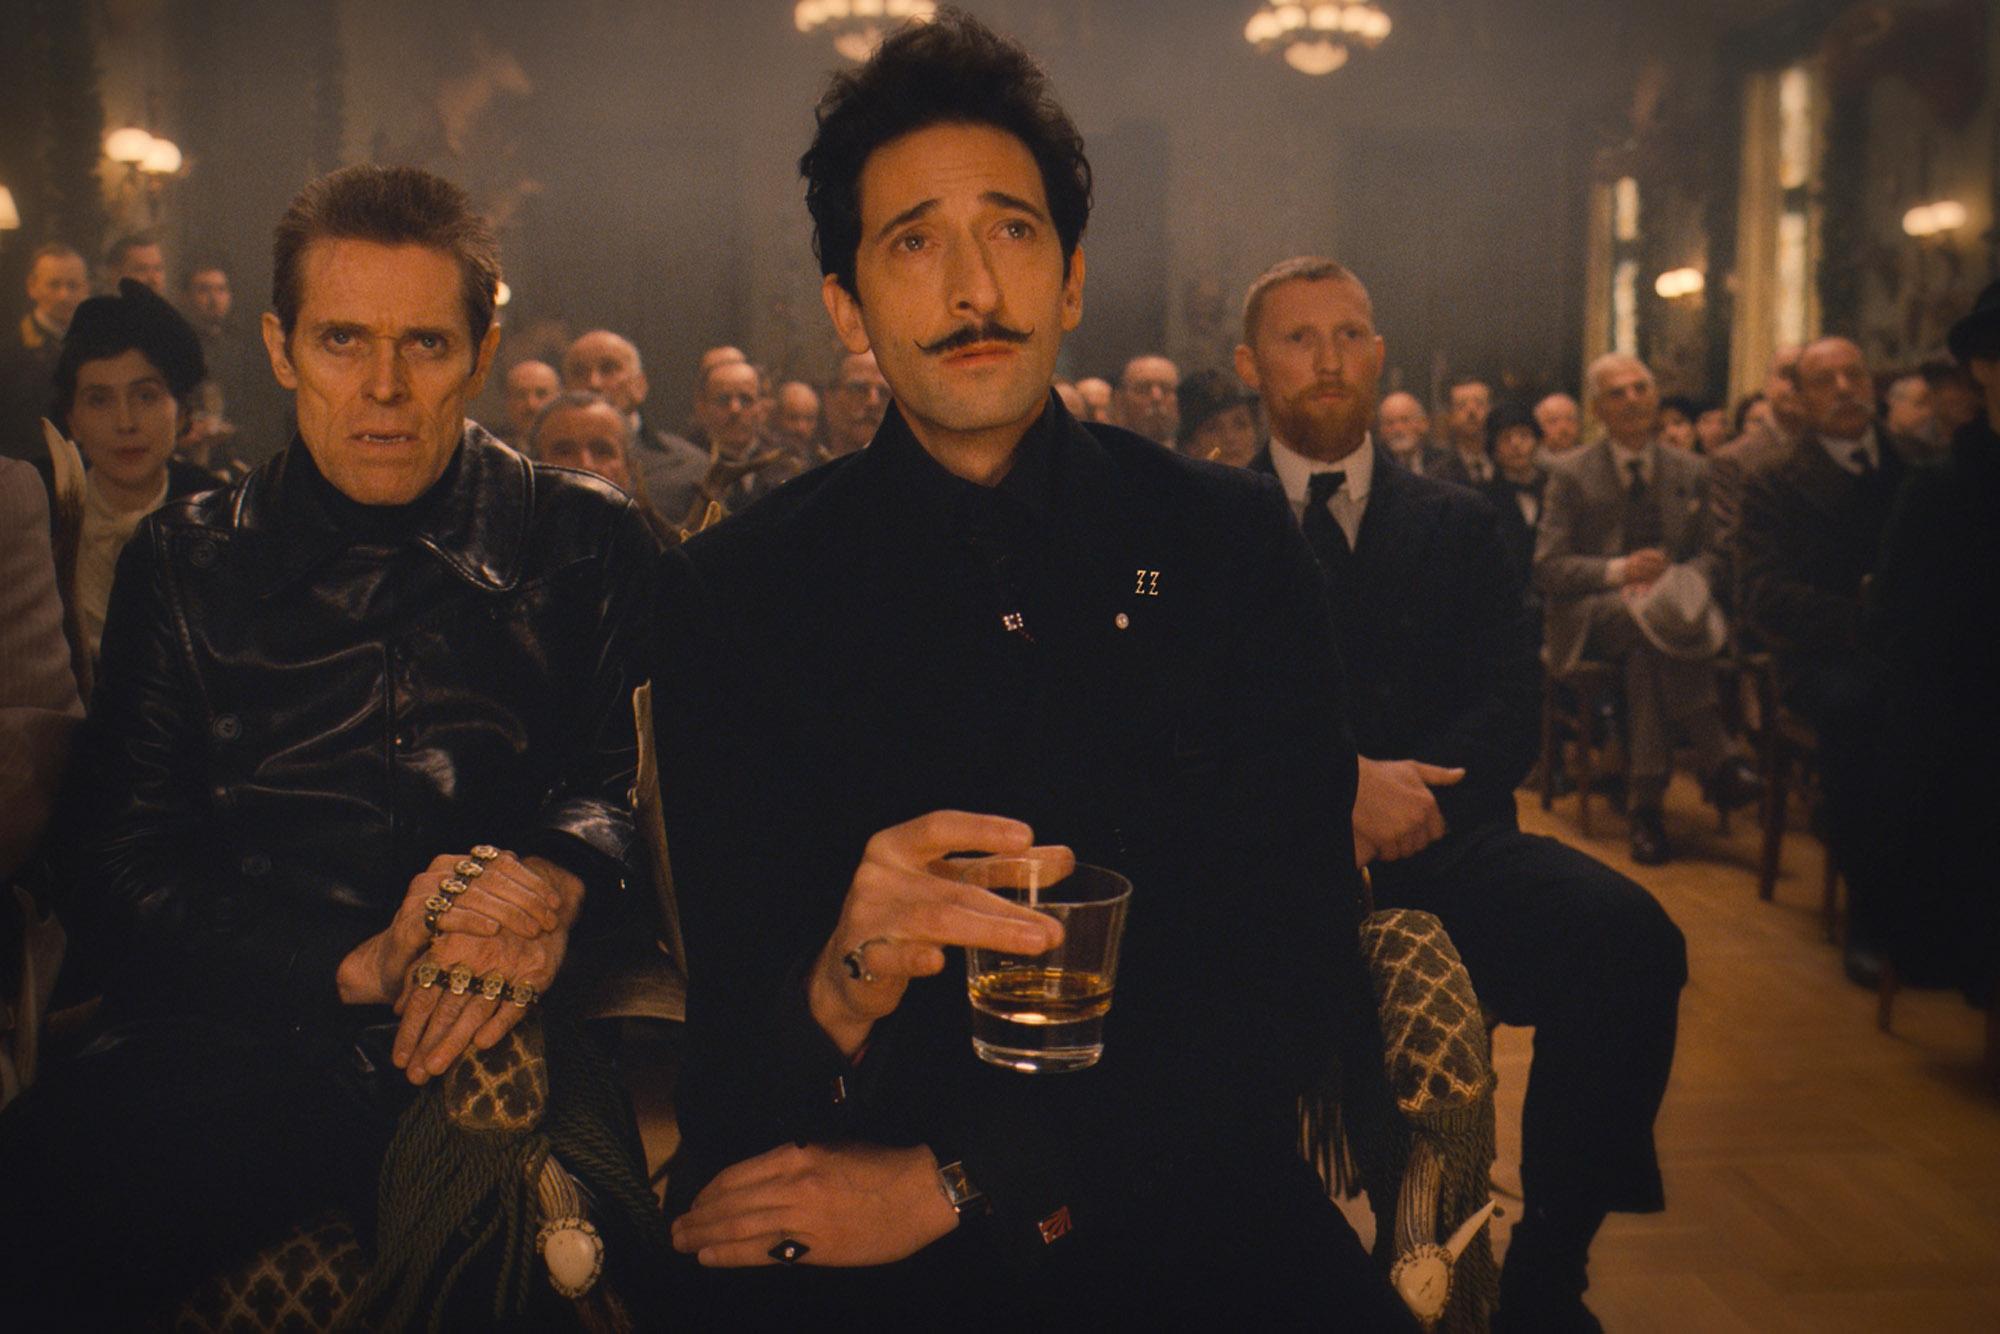 Dimitri in The Grand Budapest Hotel art in film